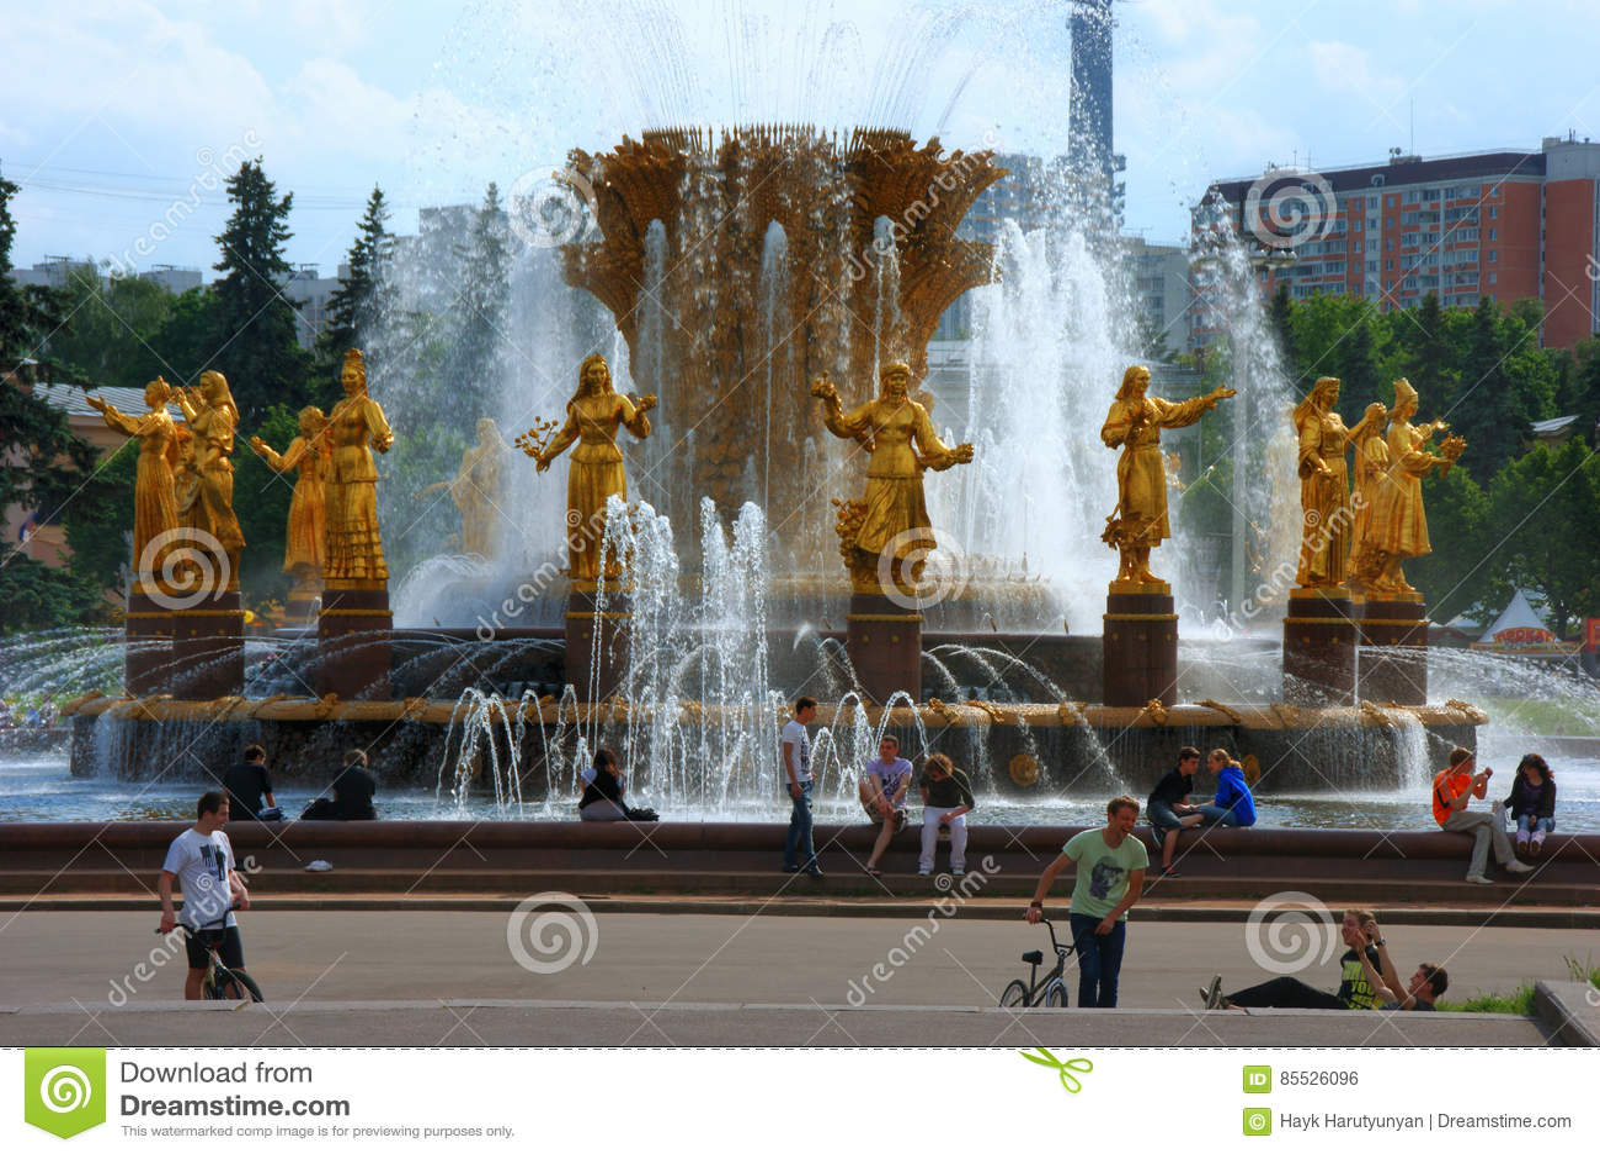 VDNX, Moscou, Russie